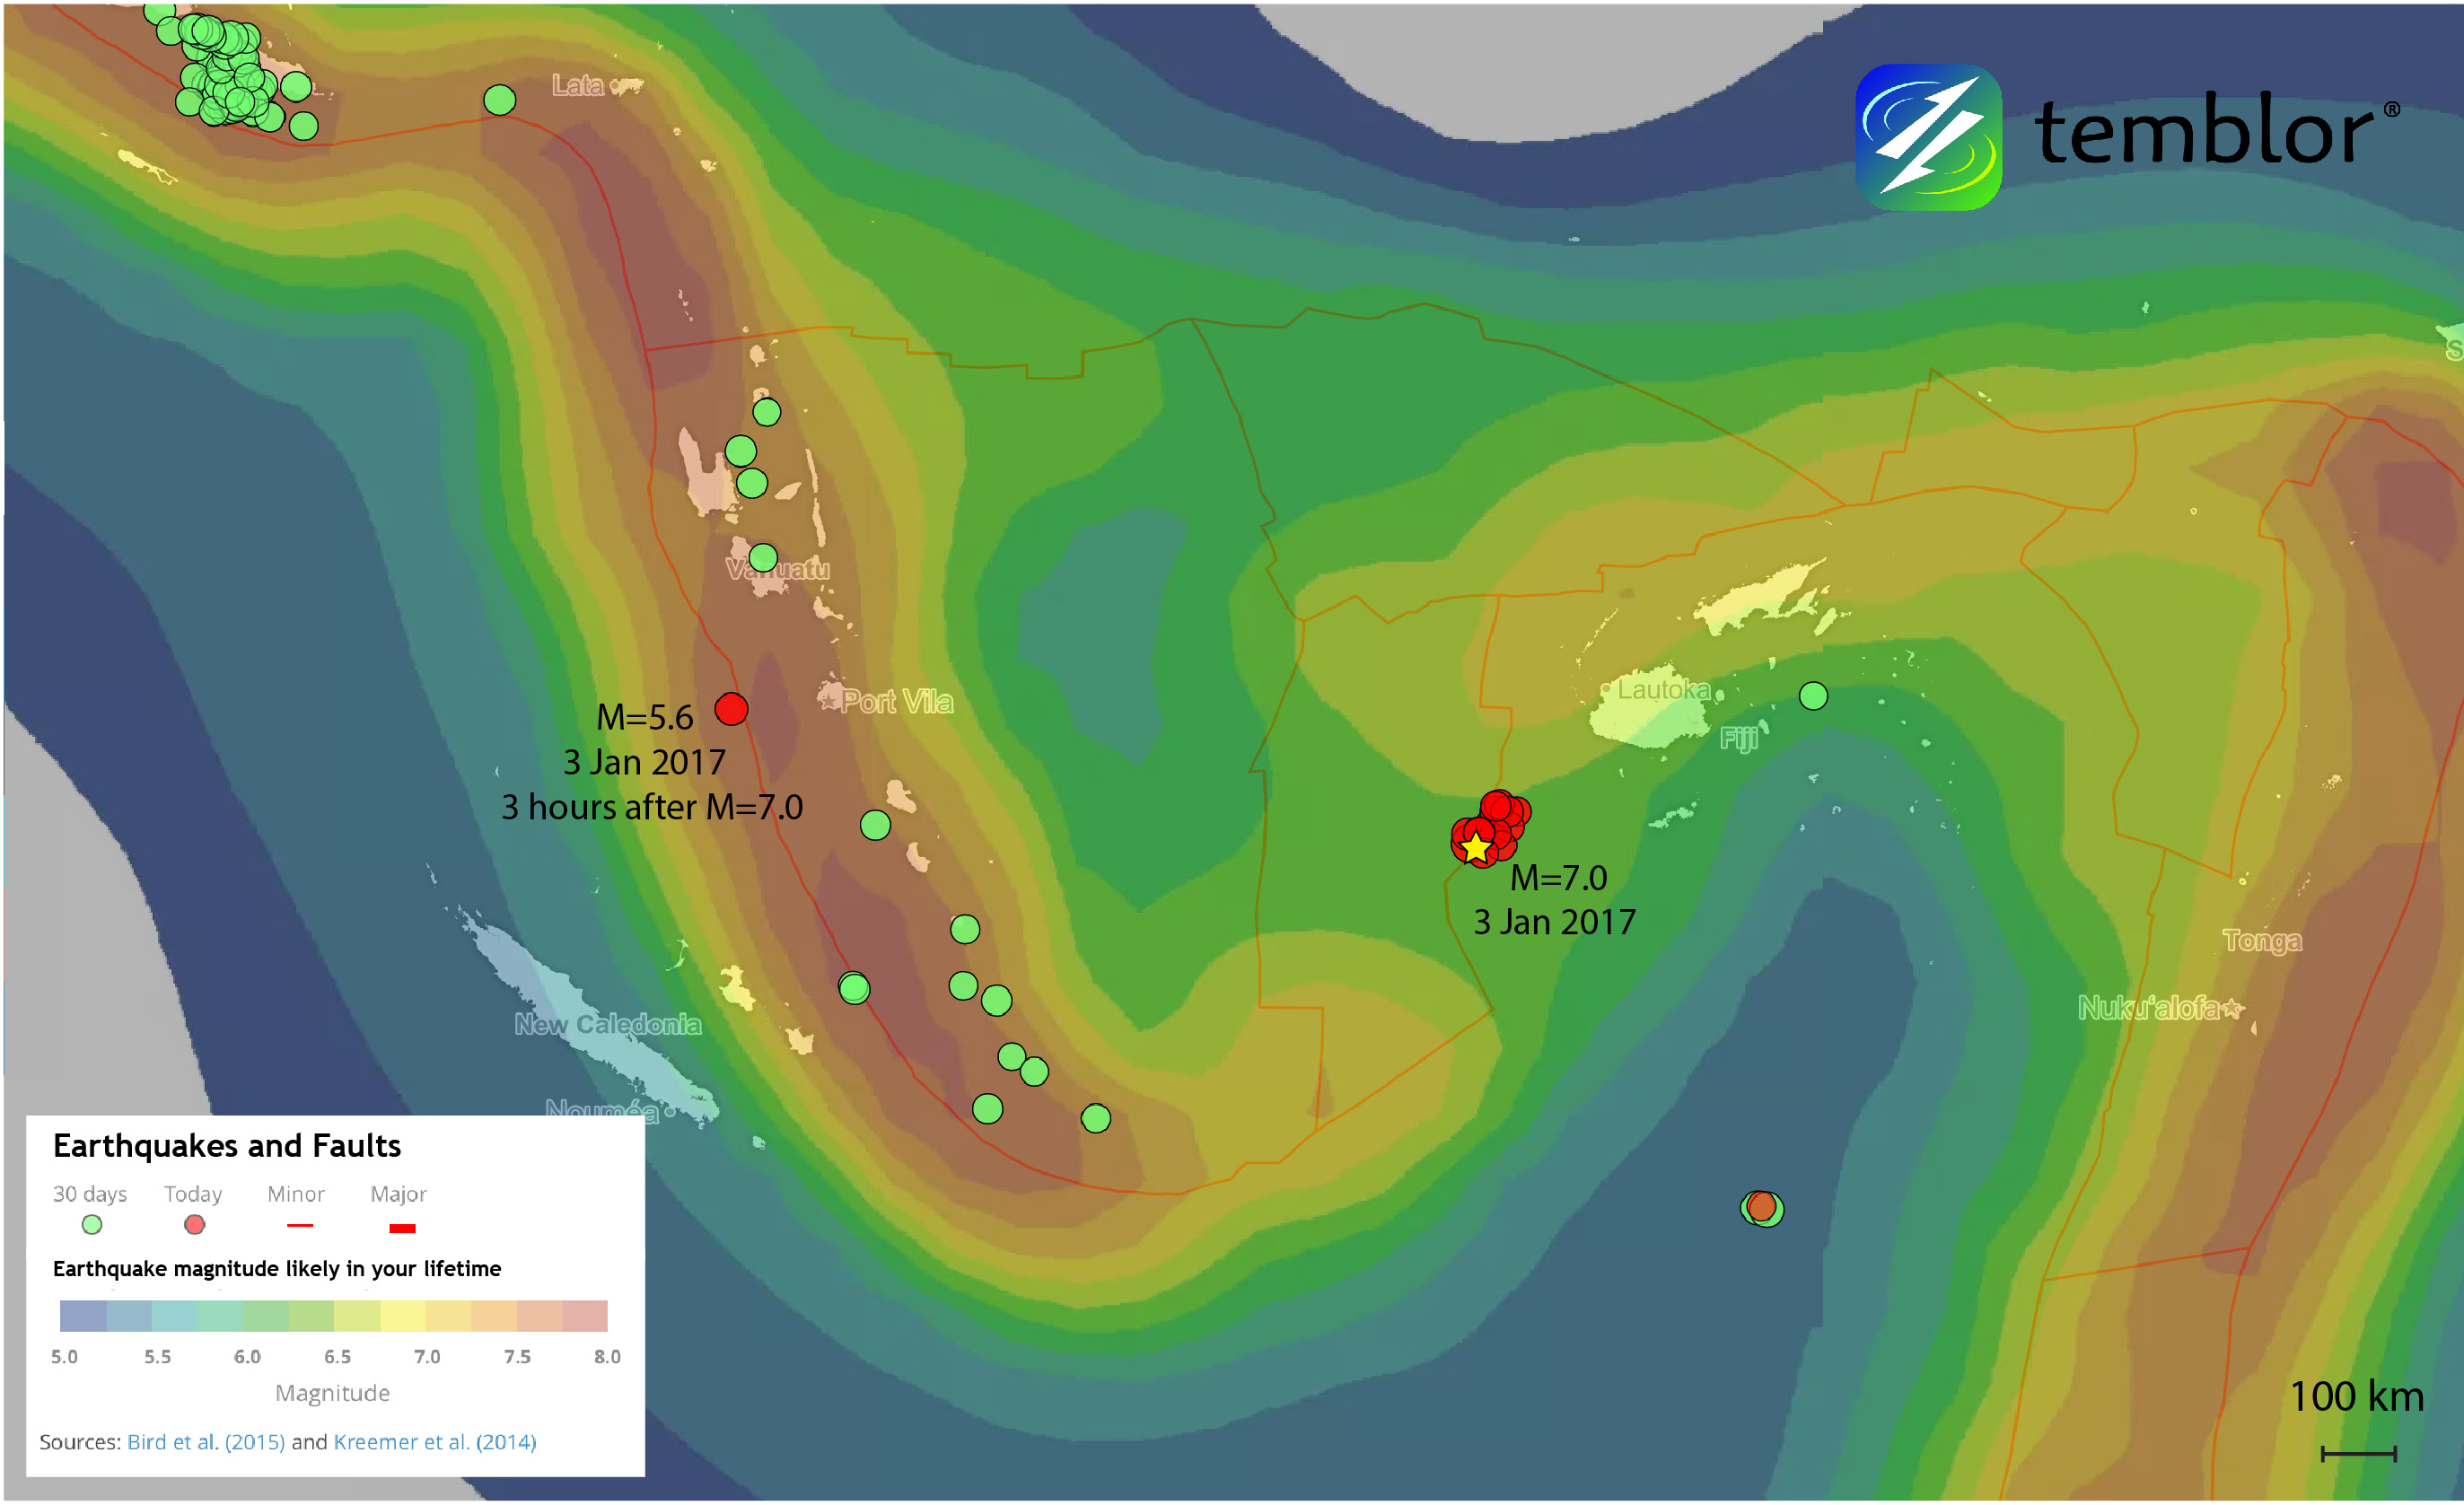 fiji-earthquake-map-global-earthquake-activity-rate